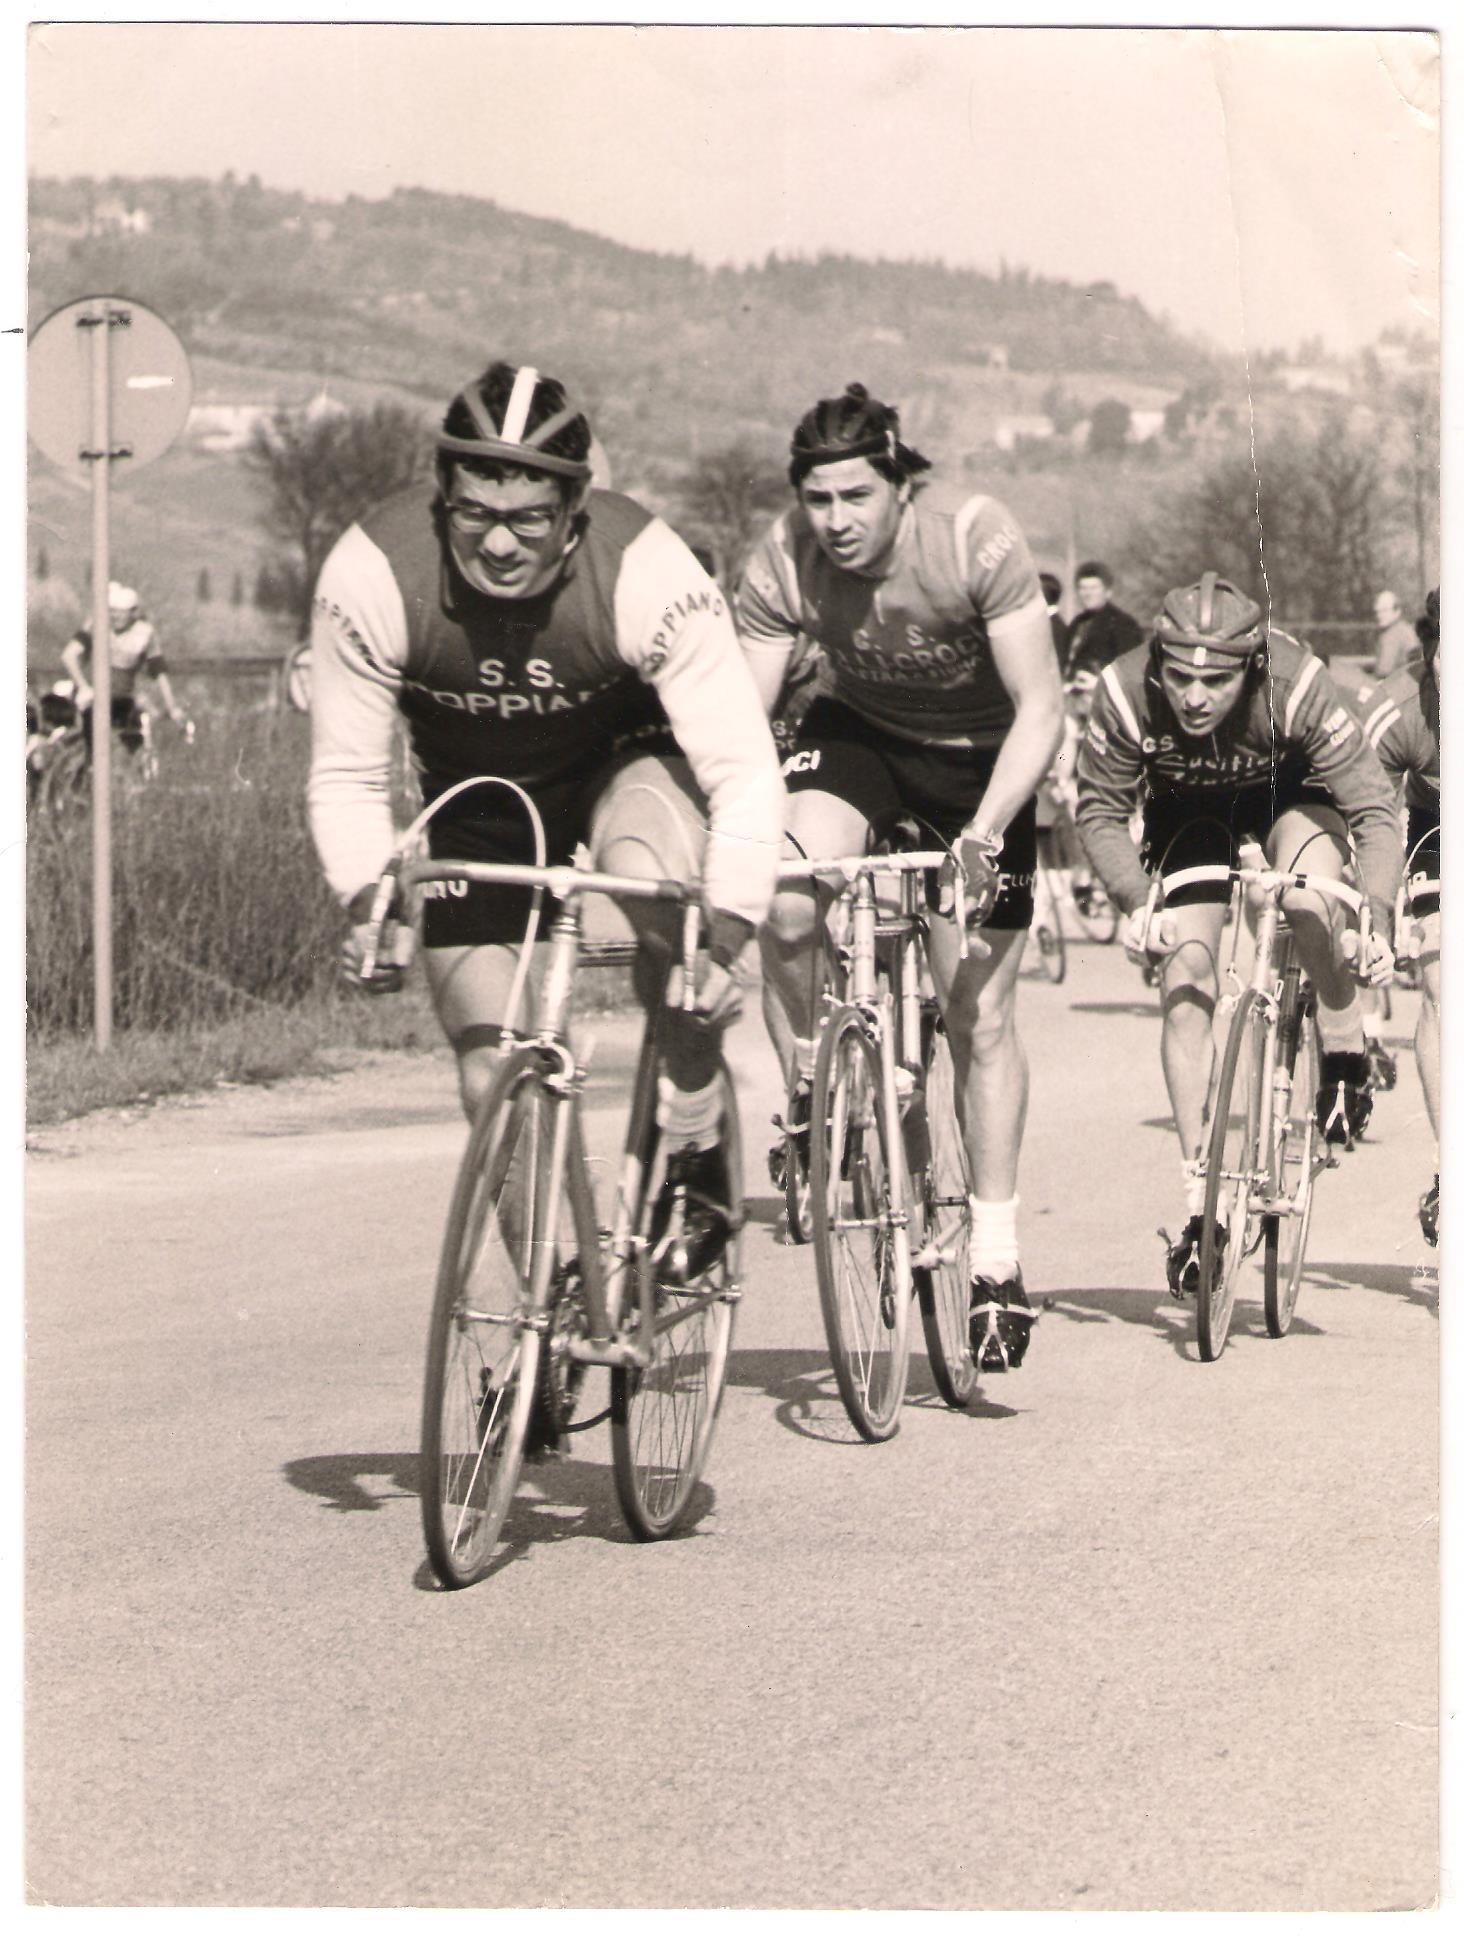 1977-marzo-orlando-cerreto-guioli